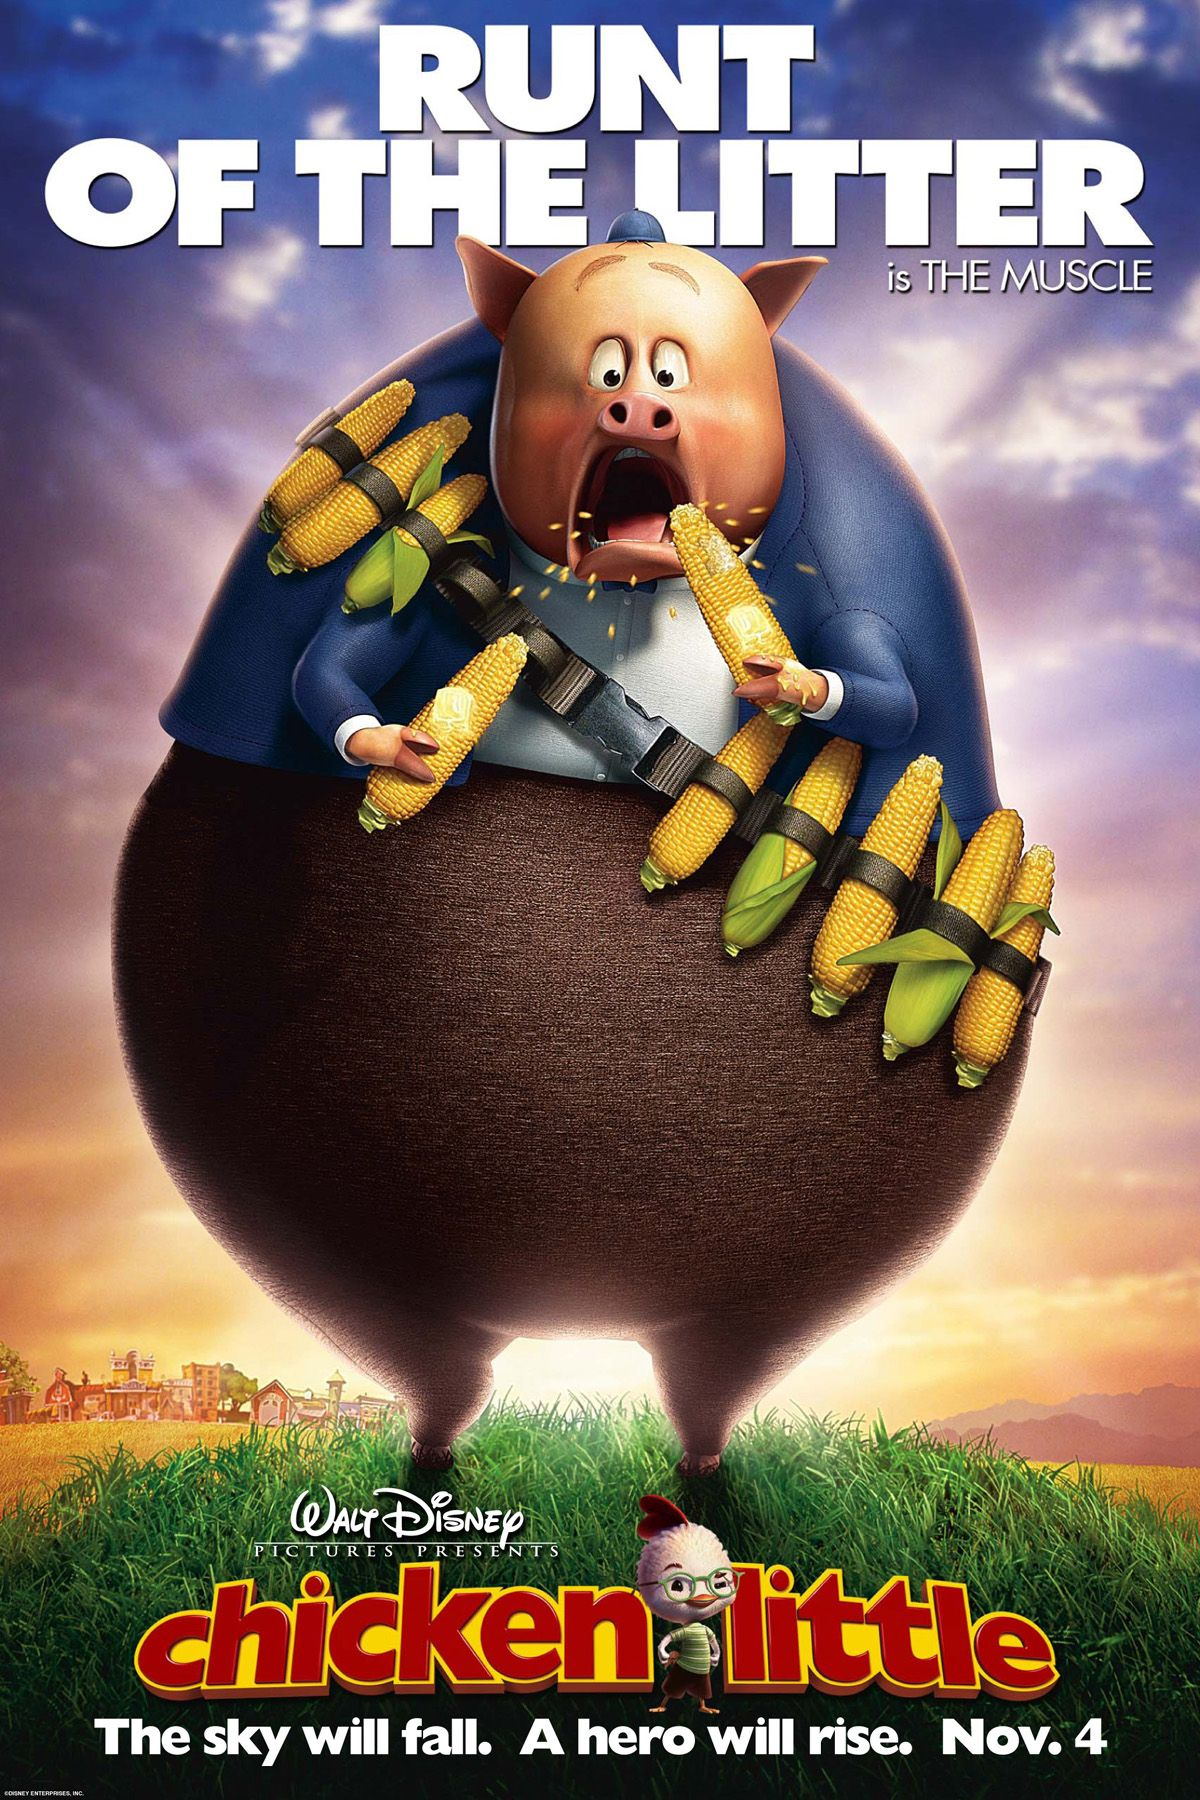 Steve Zahn Runt Of The Litter Chicken Little Chicken Little 2005 C Rtelesmix Es Peliculas De Disney Disney Peliculas